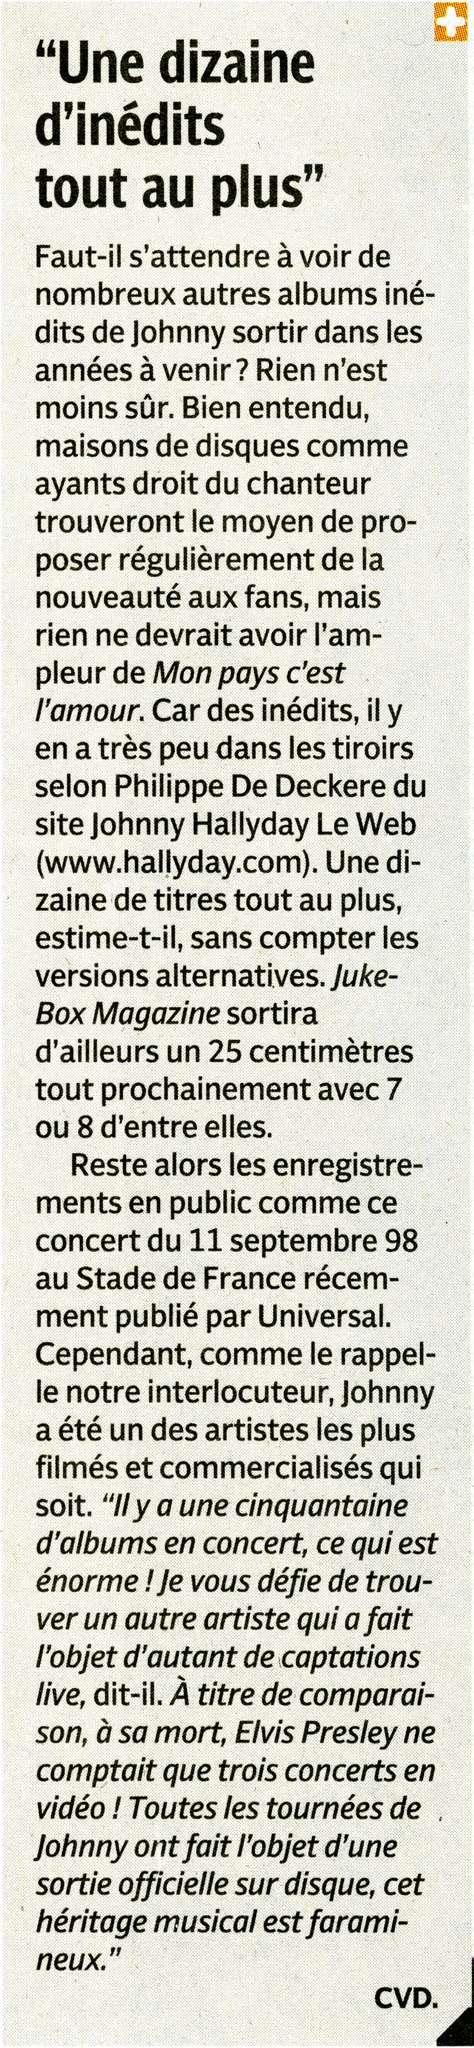 La dernière Heure (Journal belge) Dh_05-11